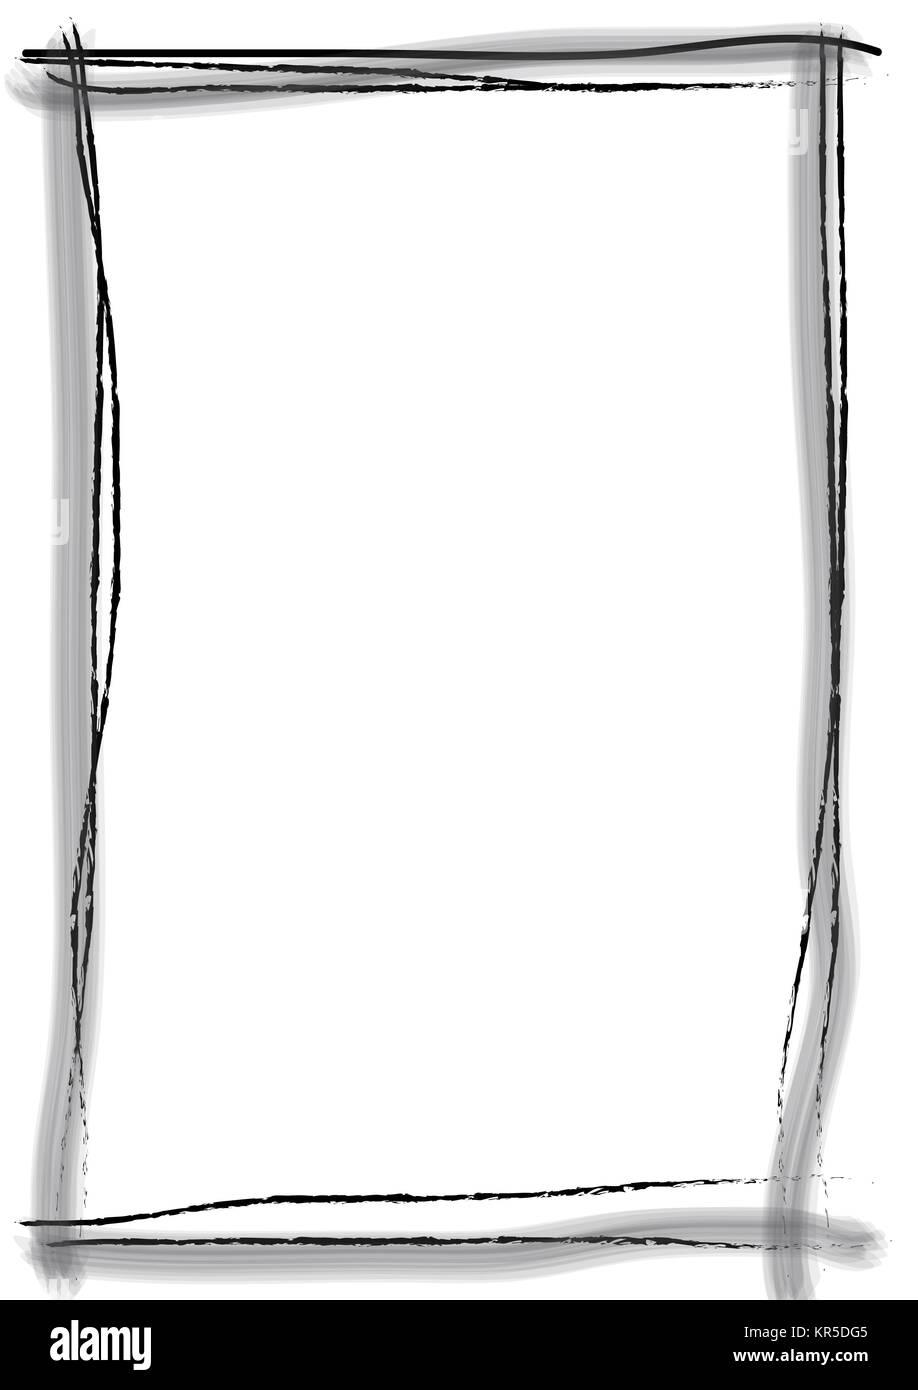 Rahmen Pinsel Strich schwarz Stock Photo: 169150805 - Alamy